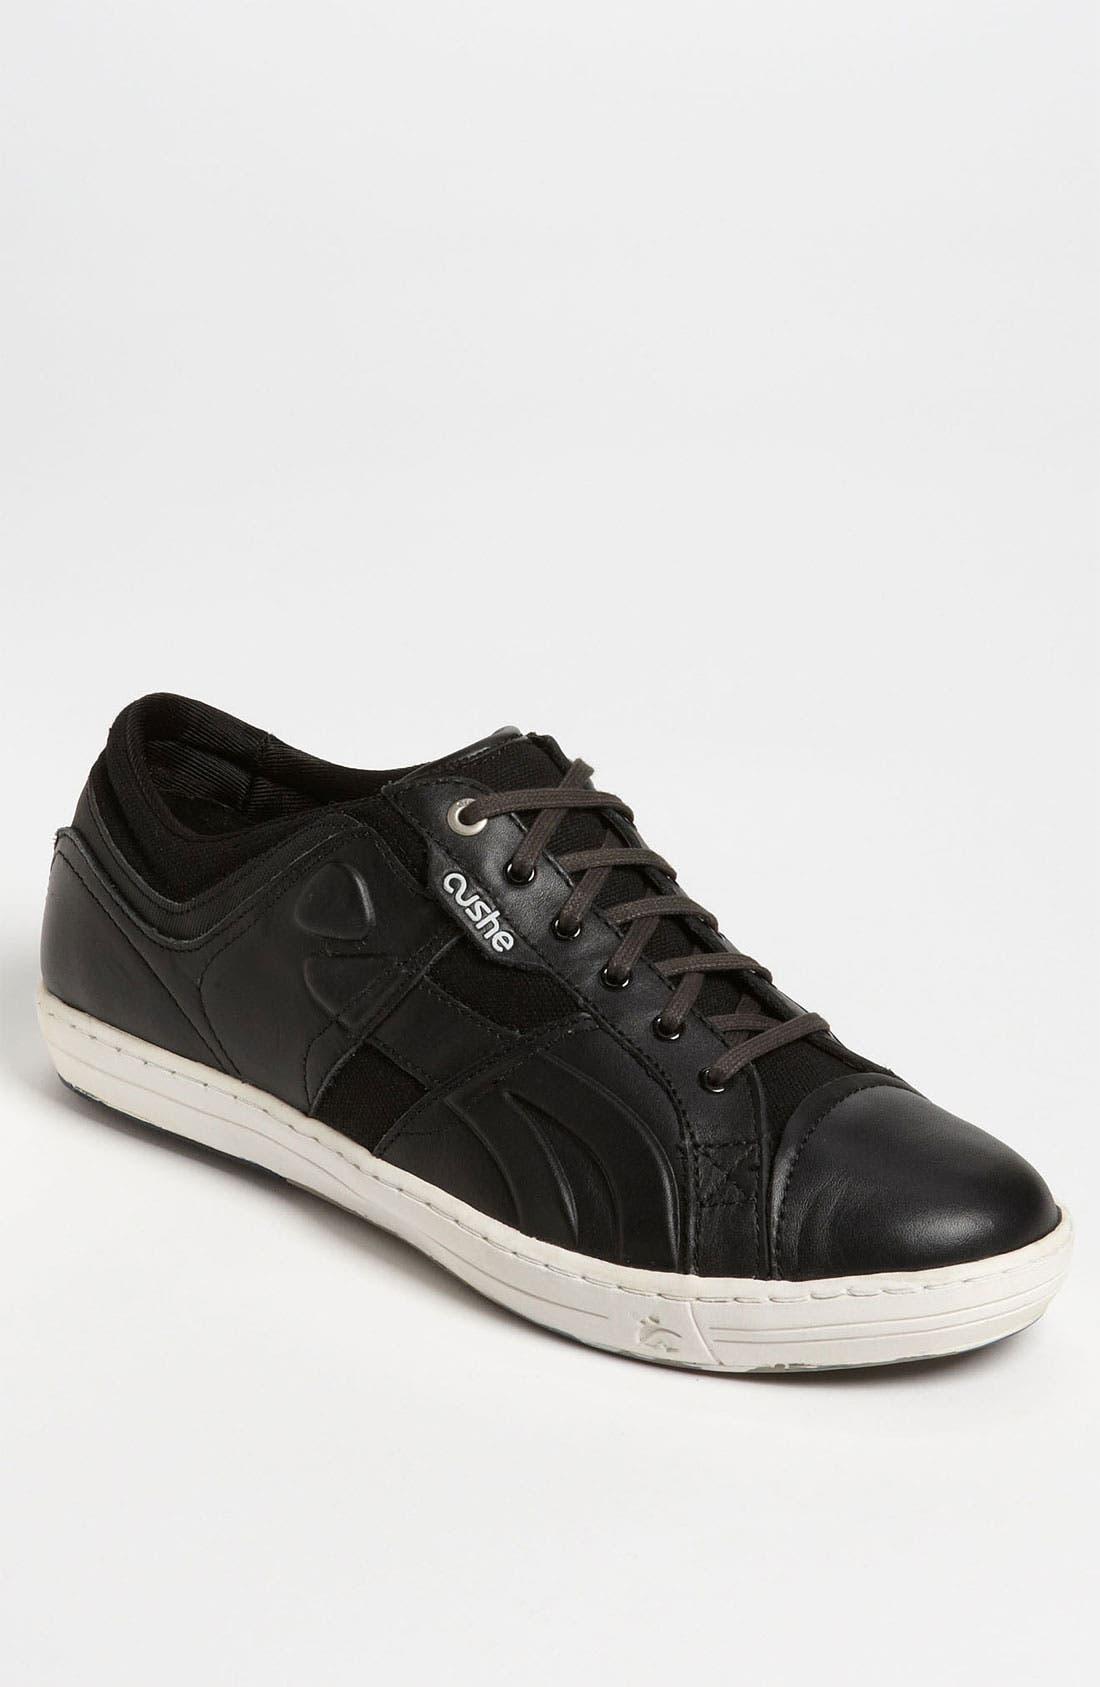 Main Image - Cushe 'The Standard' Sneaker